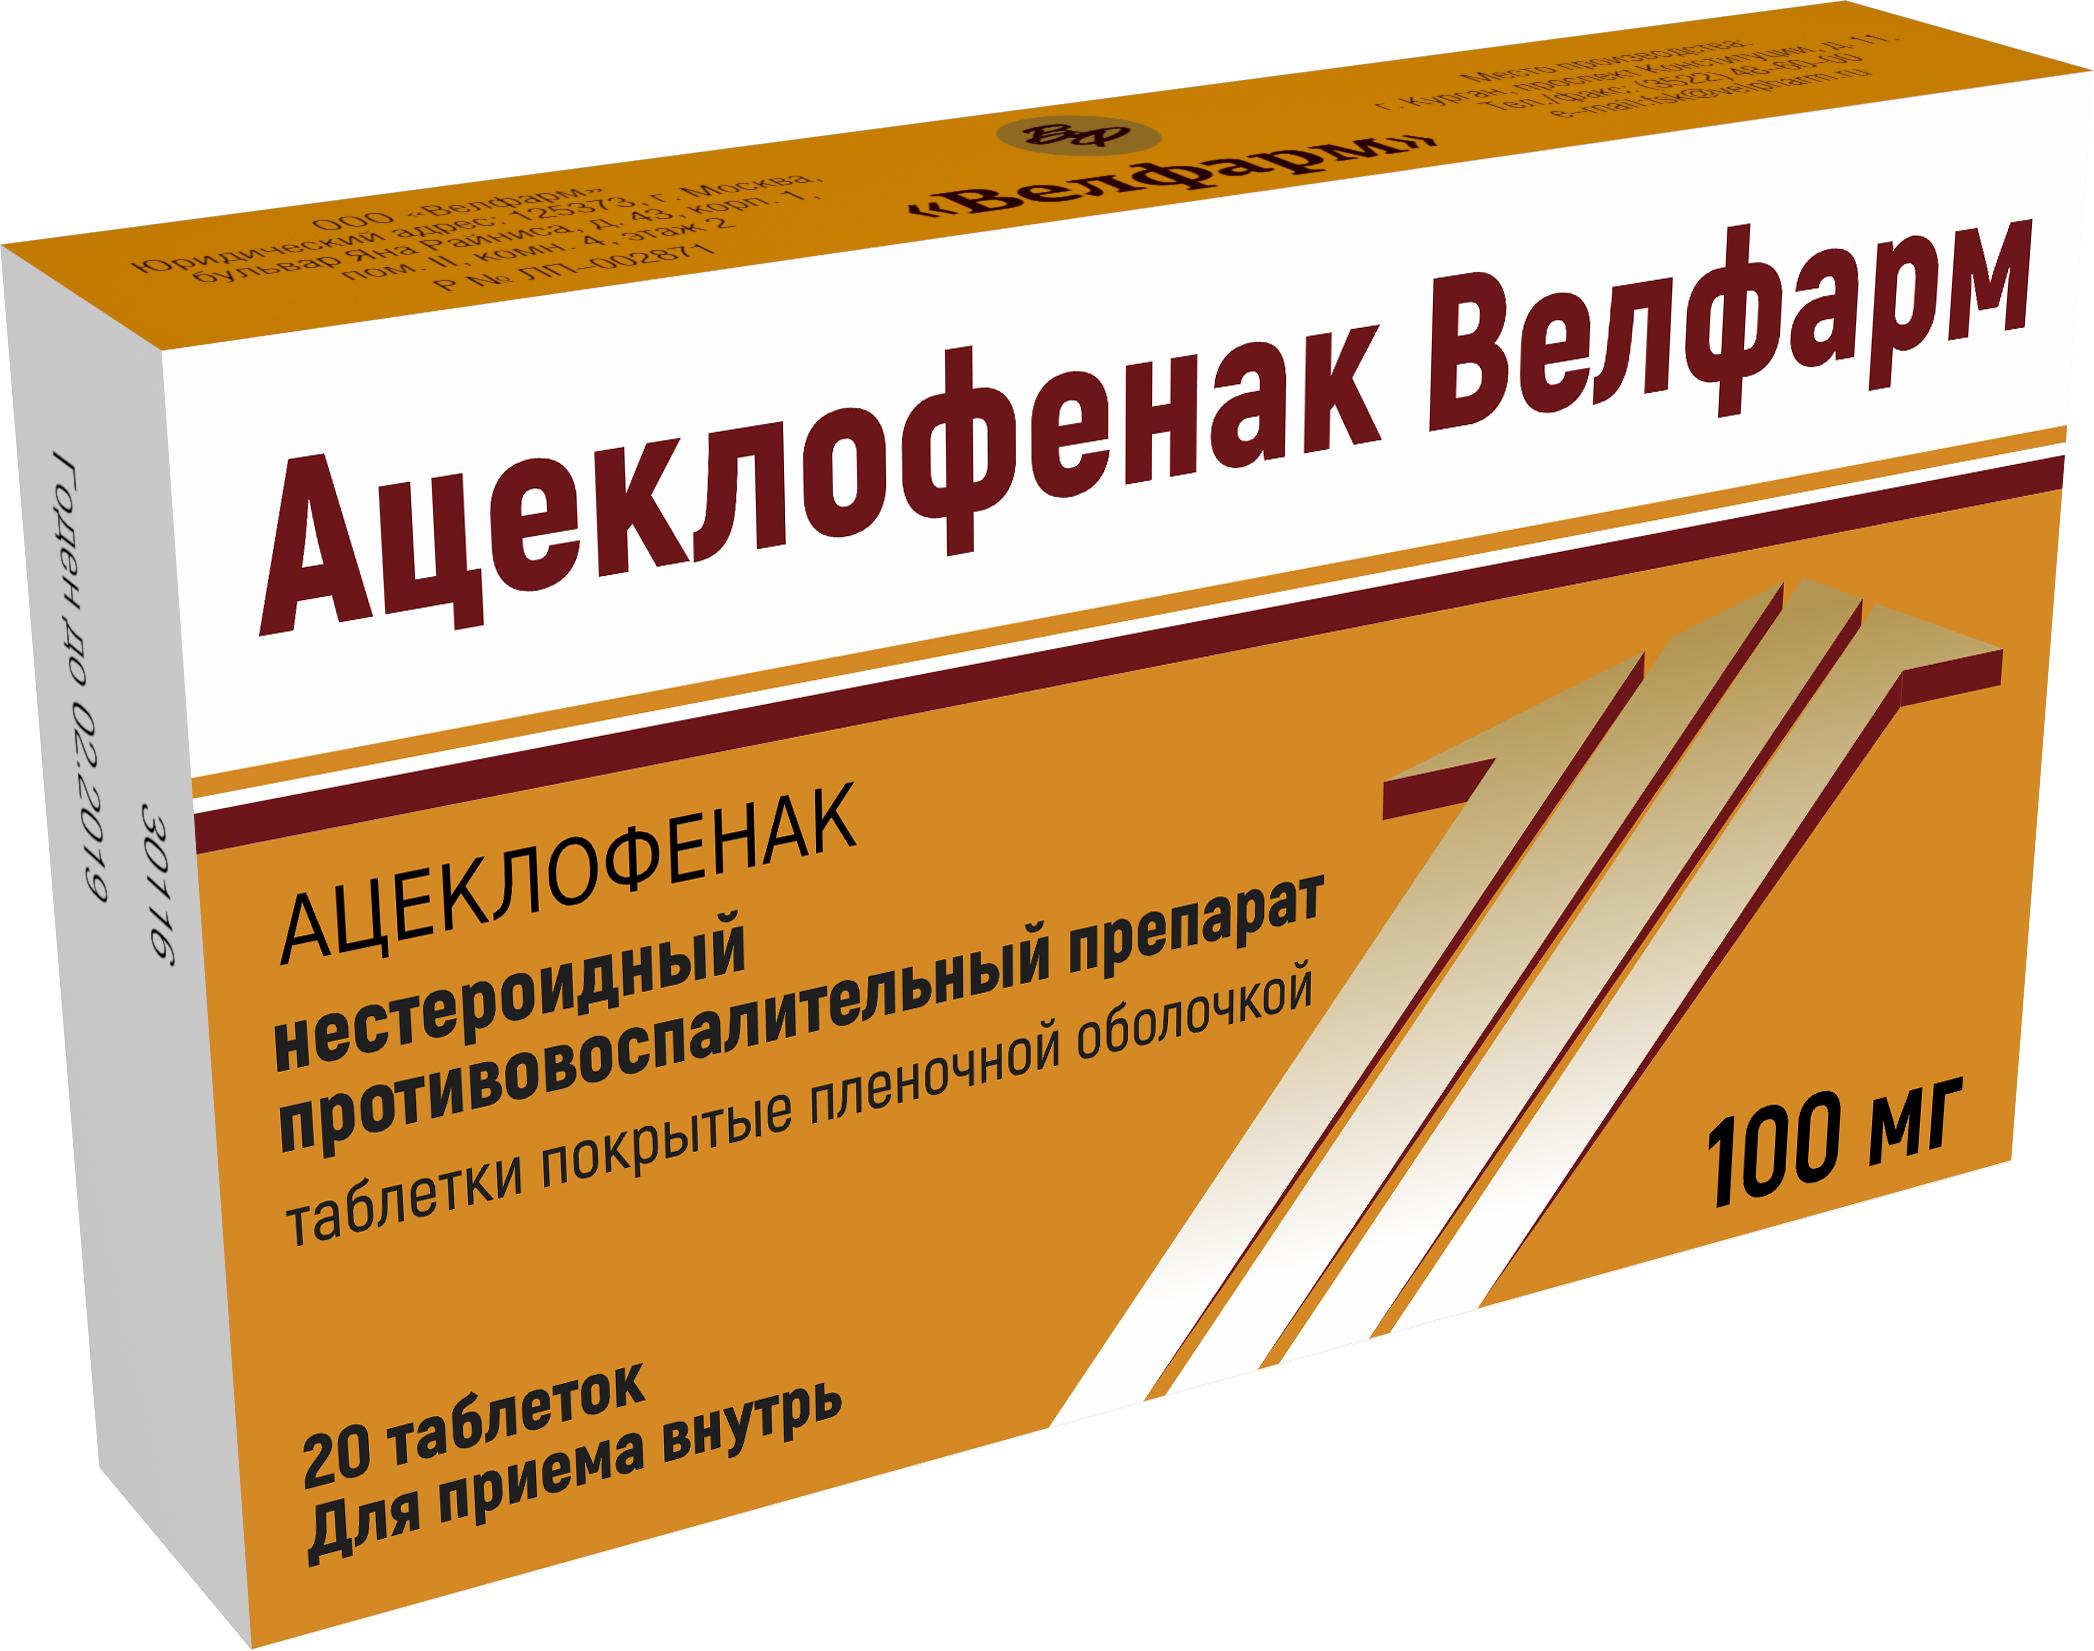 Ацеклофенак таблетки п.п.о. 100мг №20 Велфарм